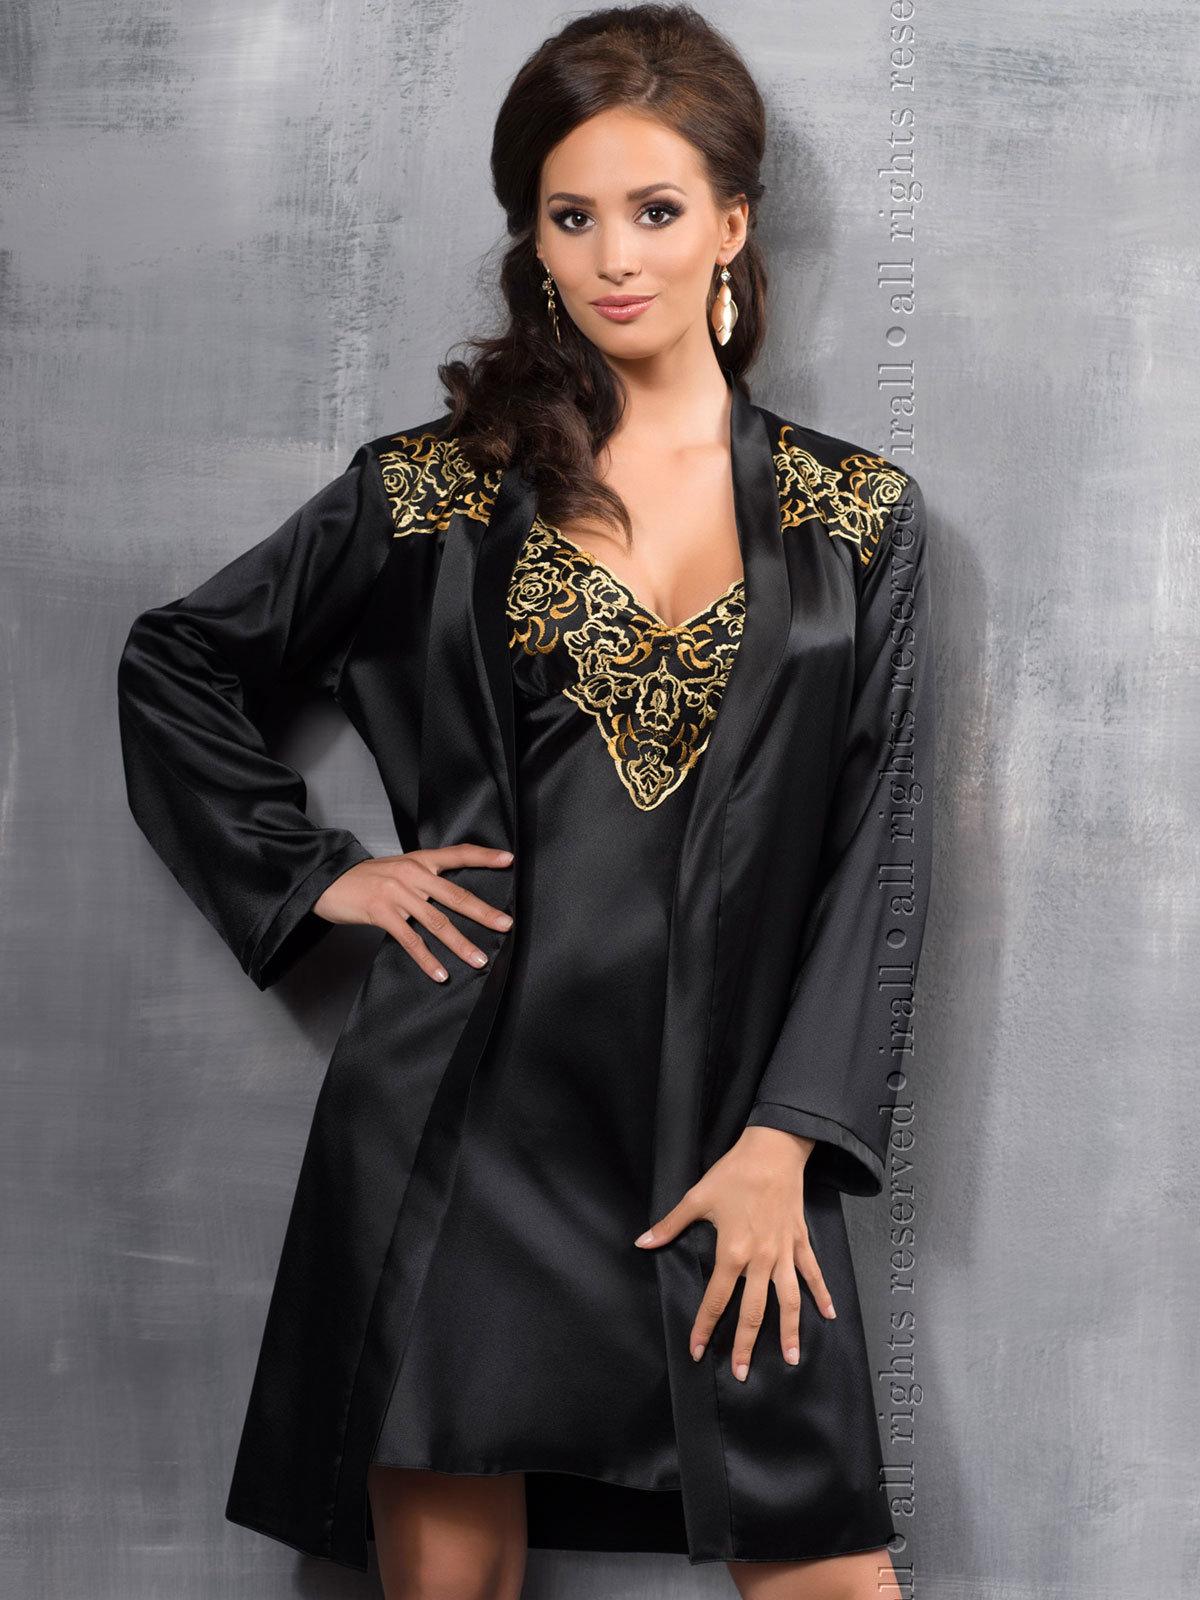 Irall Halat Luna Dressing gown Negru